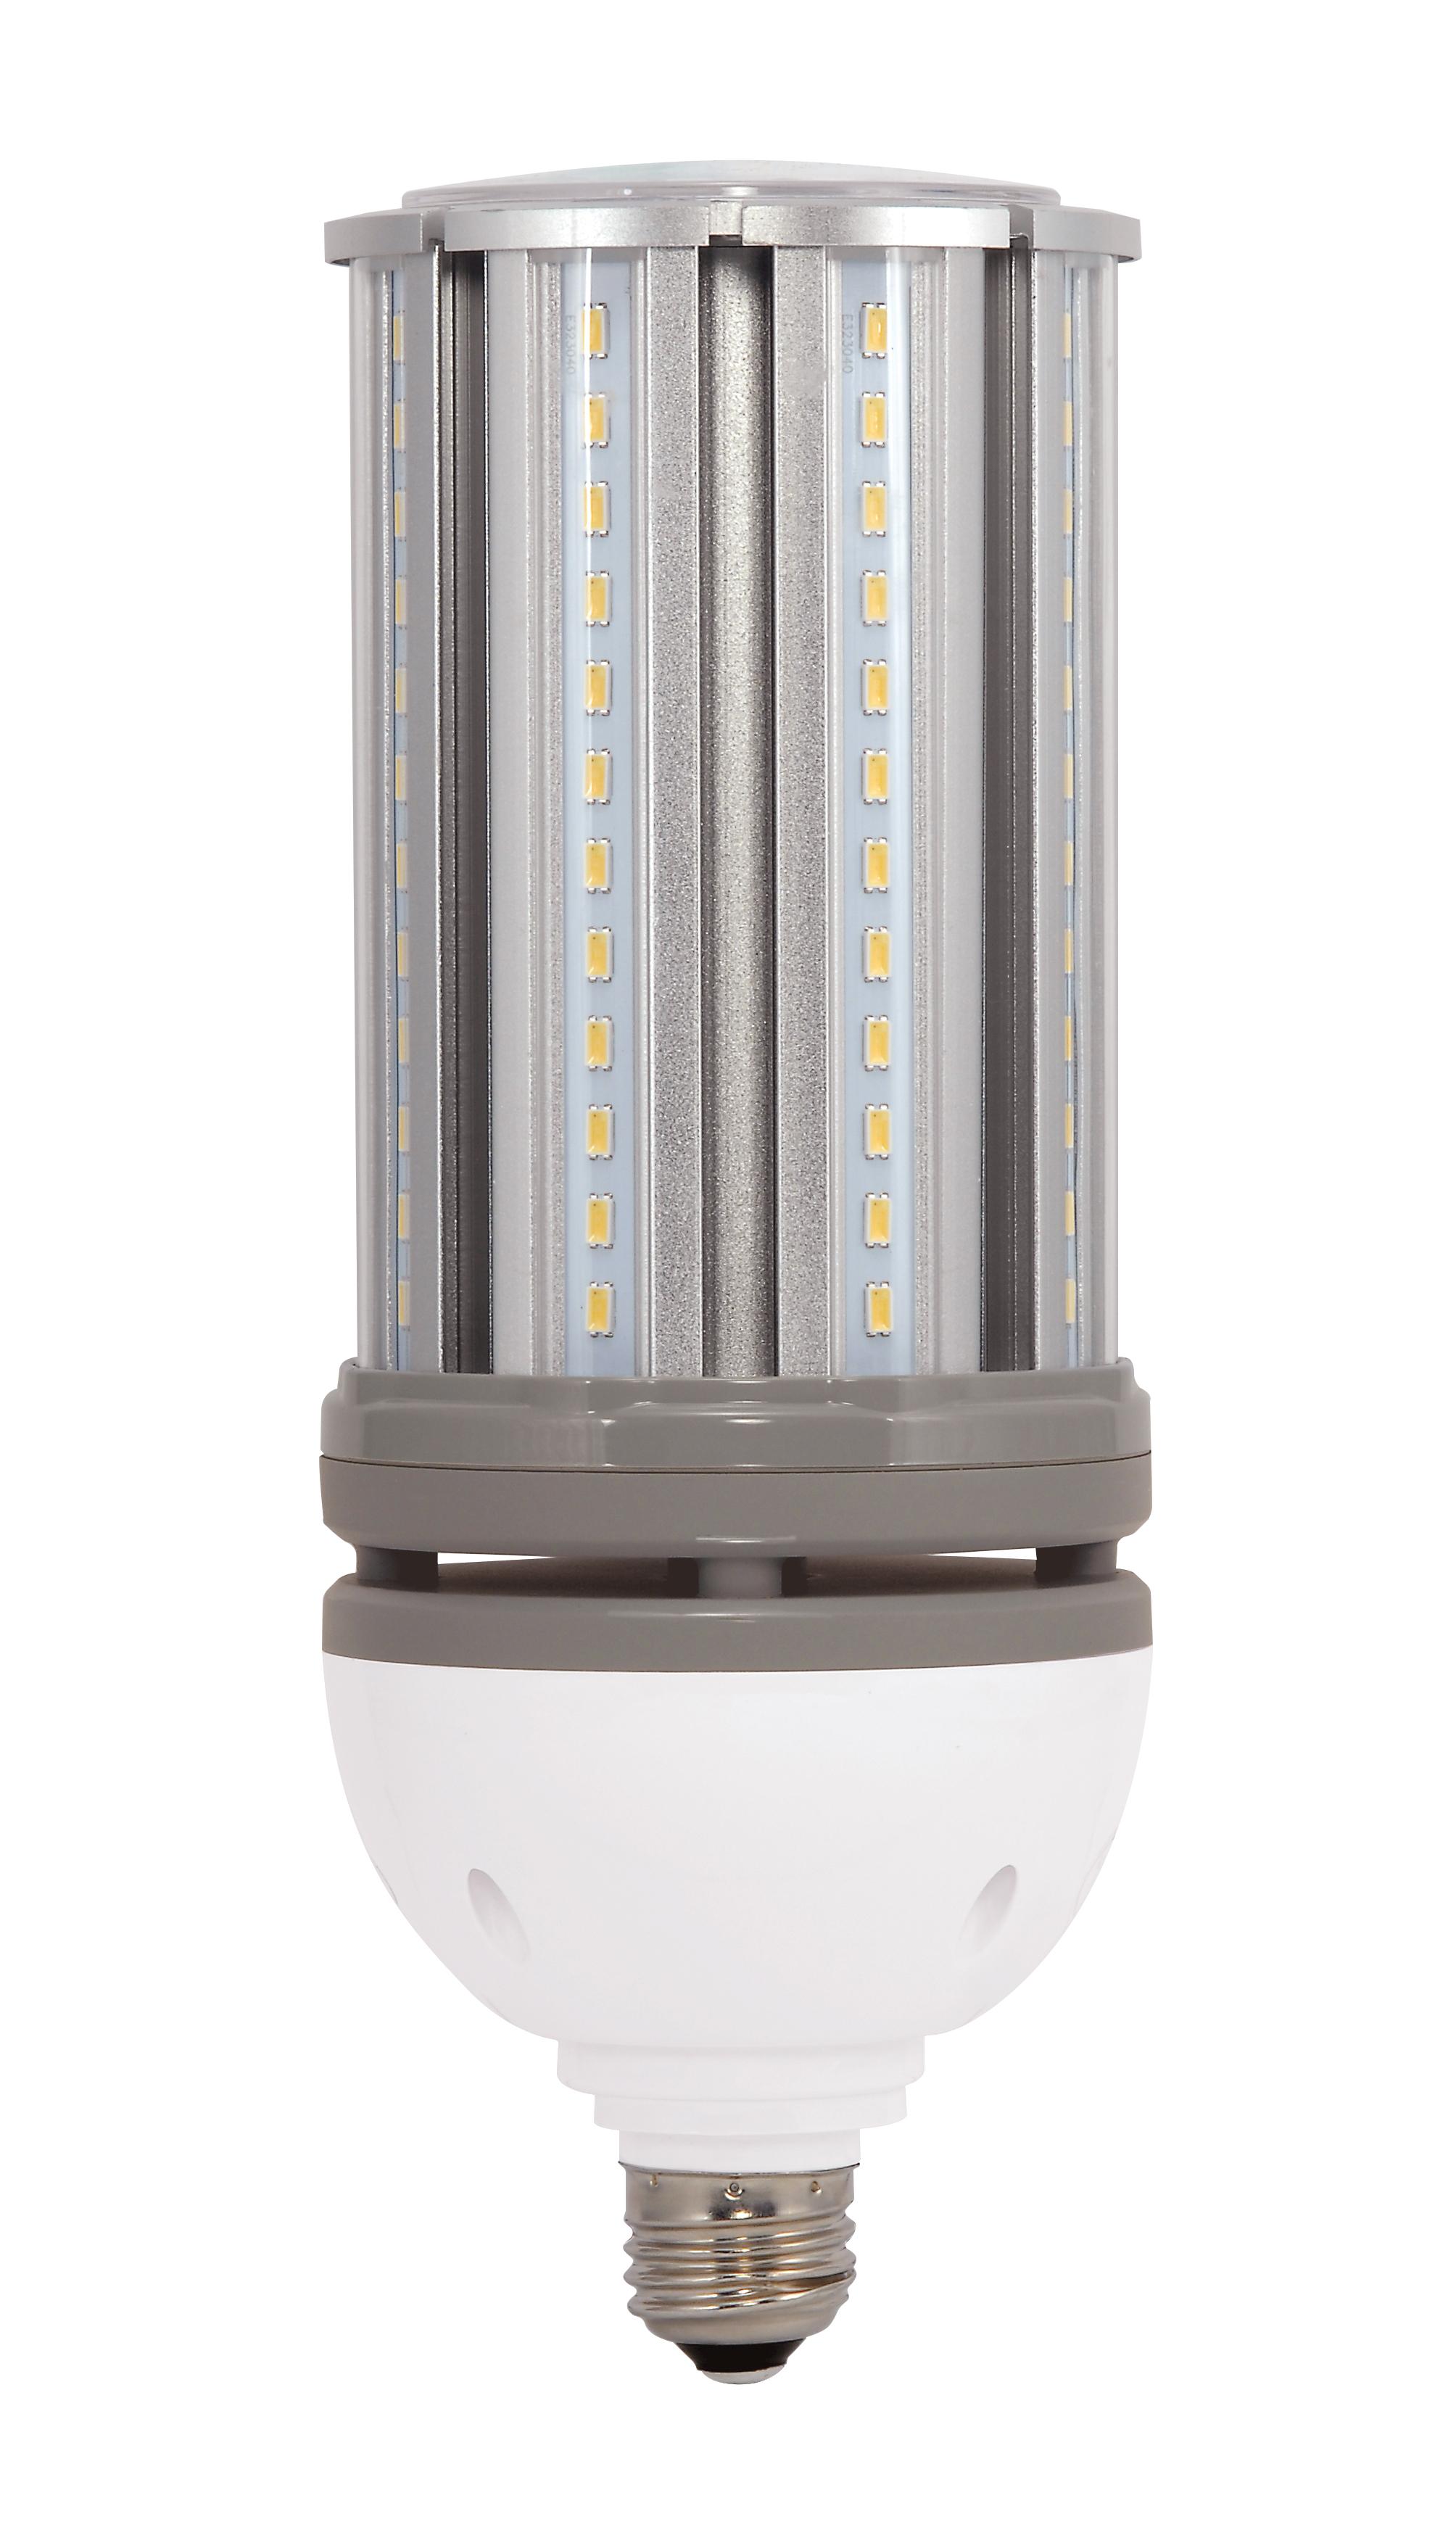 Satco,S9392,36W/LED/HID/5000K/100-277V E26